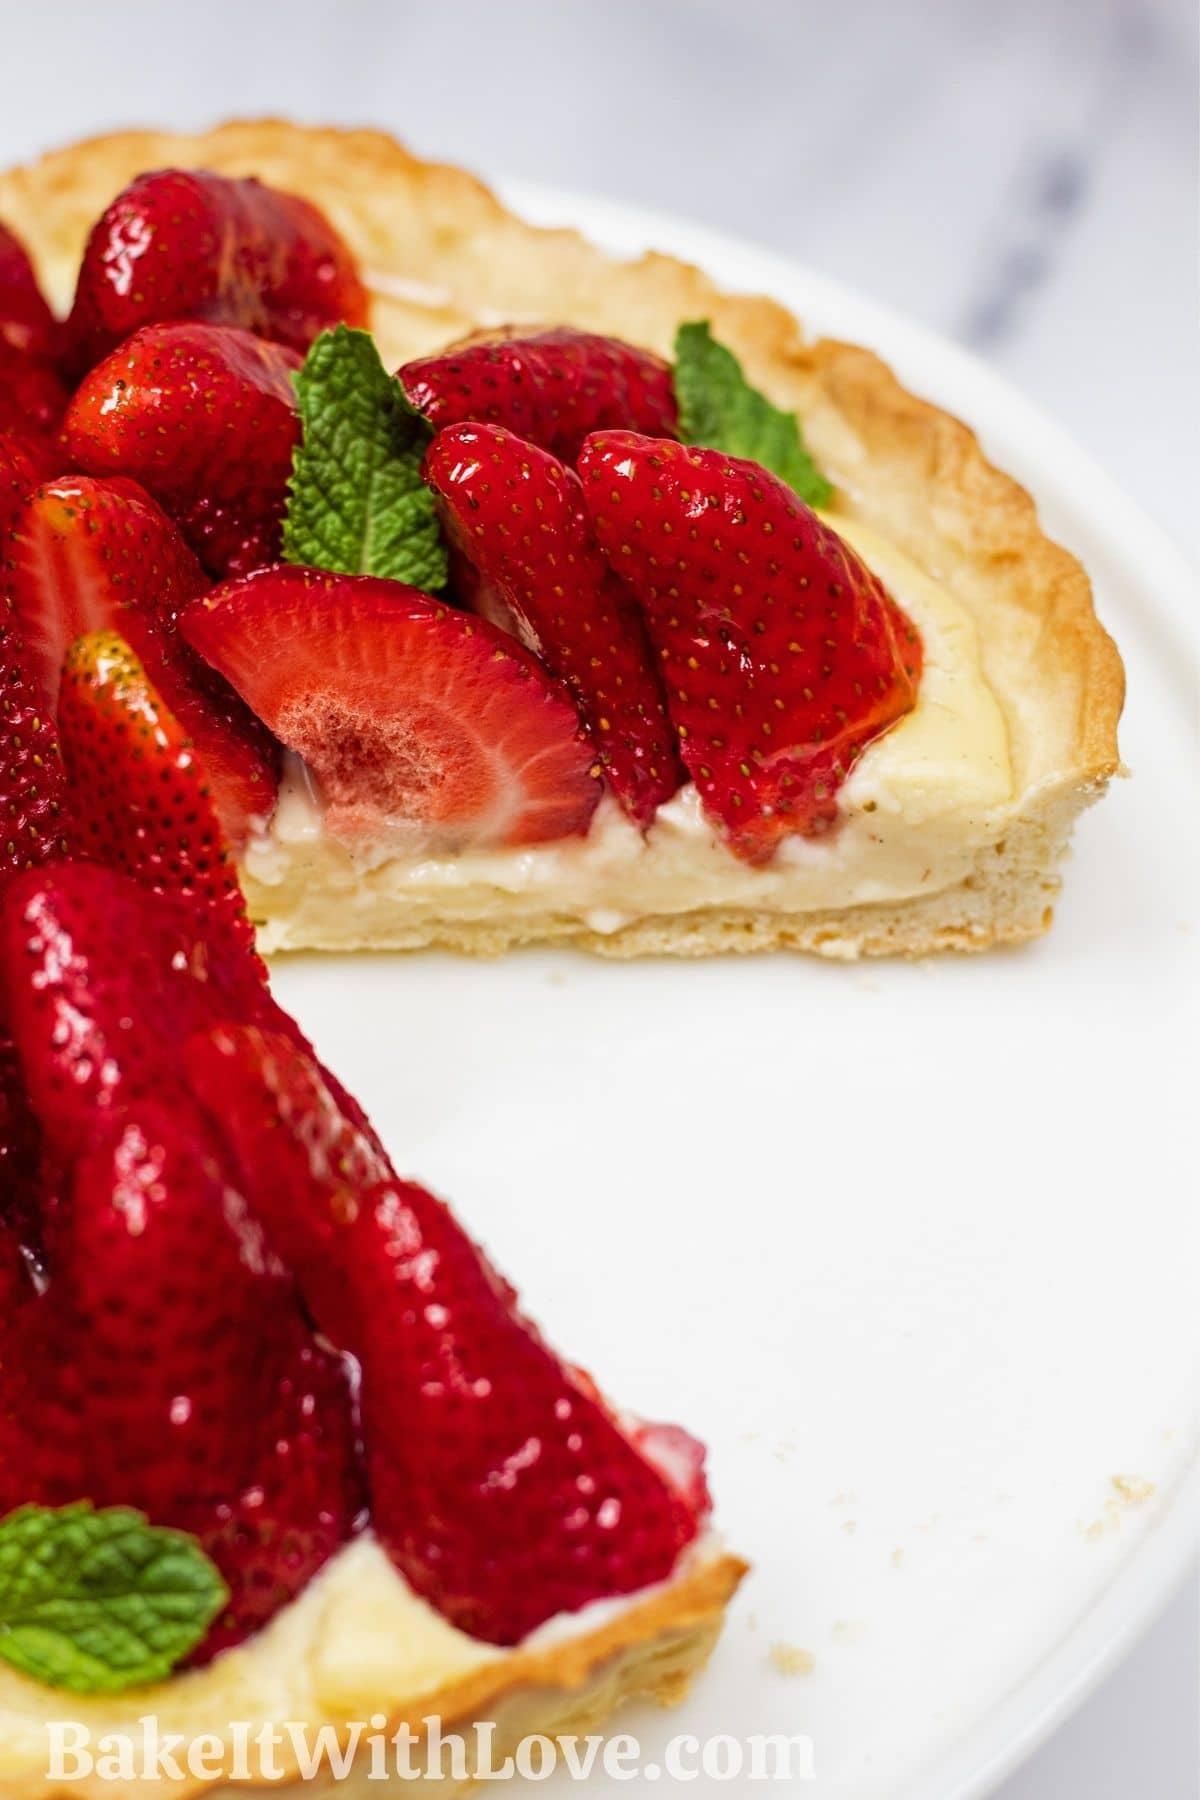 Tarte aux Fraisesは、スライスを切り取った白いケーキスタンドに表示されるクラシックなフレンチストロベリータルトです。